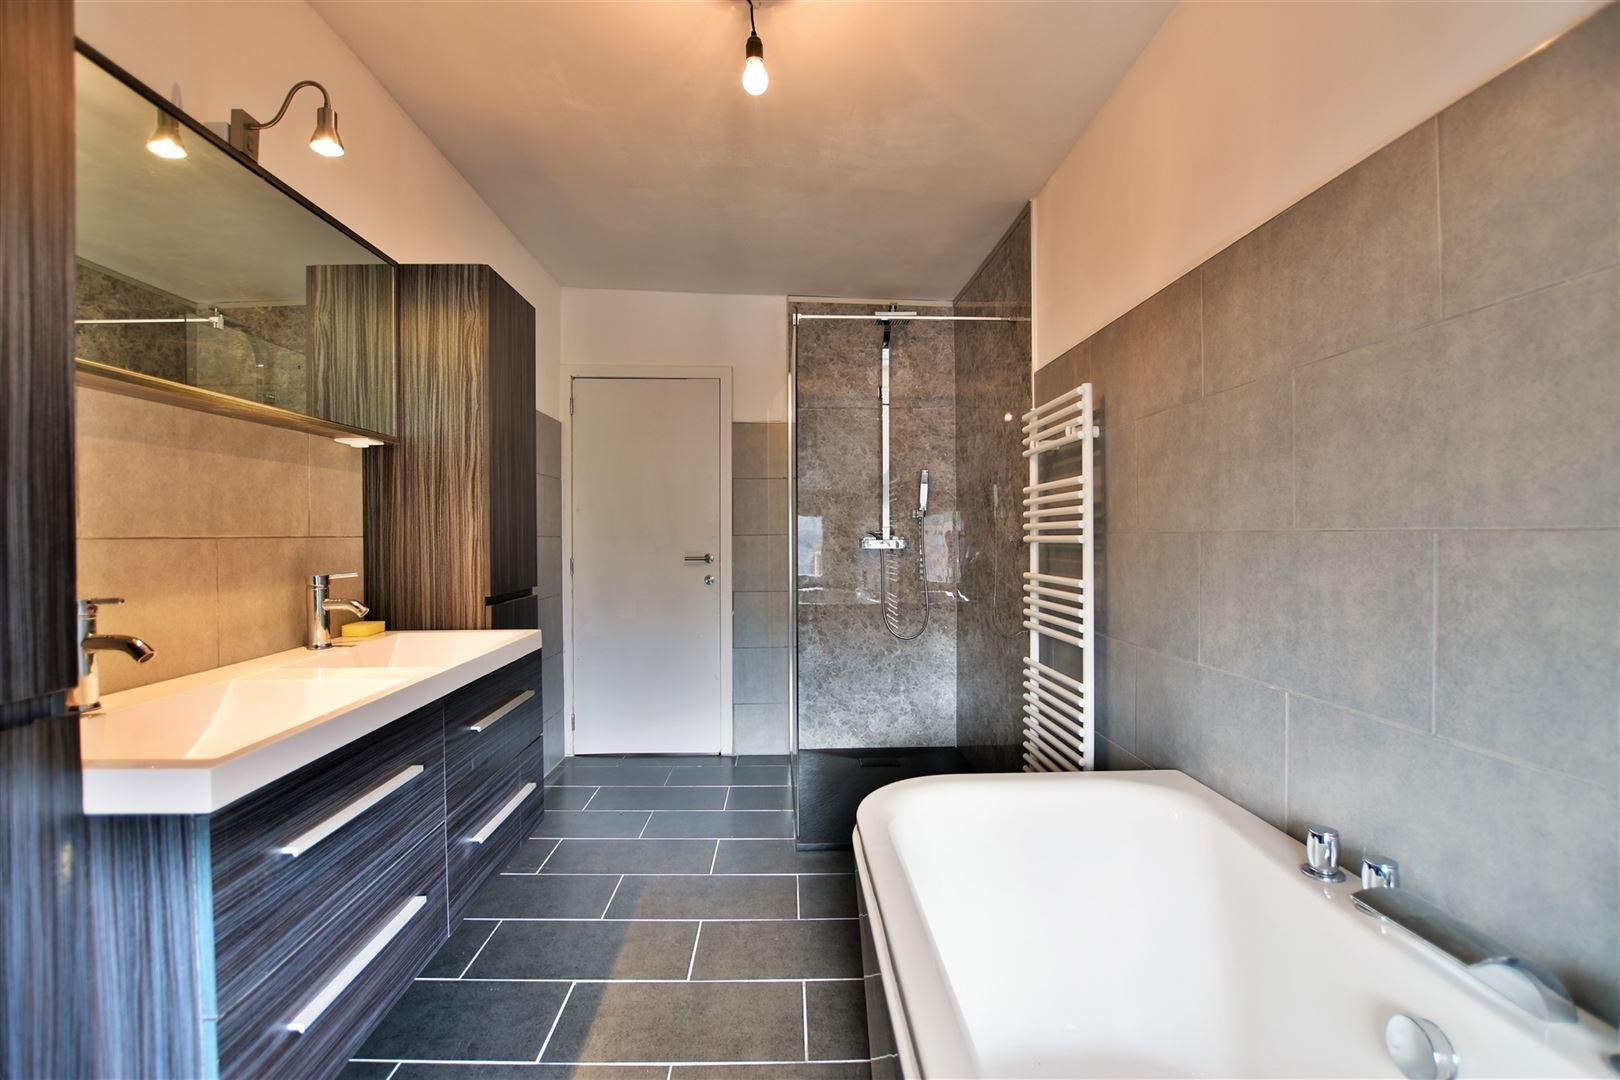 Foto 9 : Appartement te 9200 DENDERMONDE (België) - Prijs € 299.000